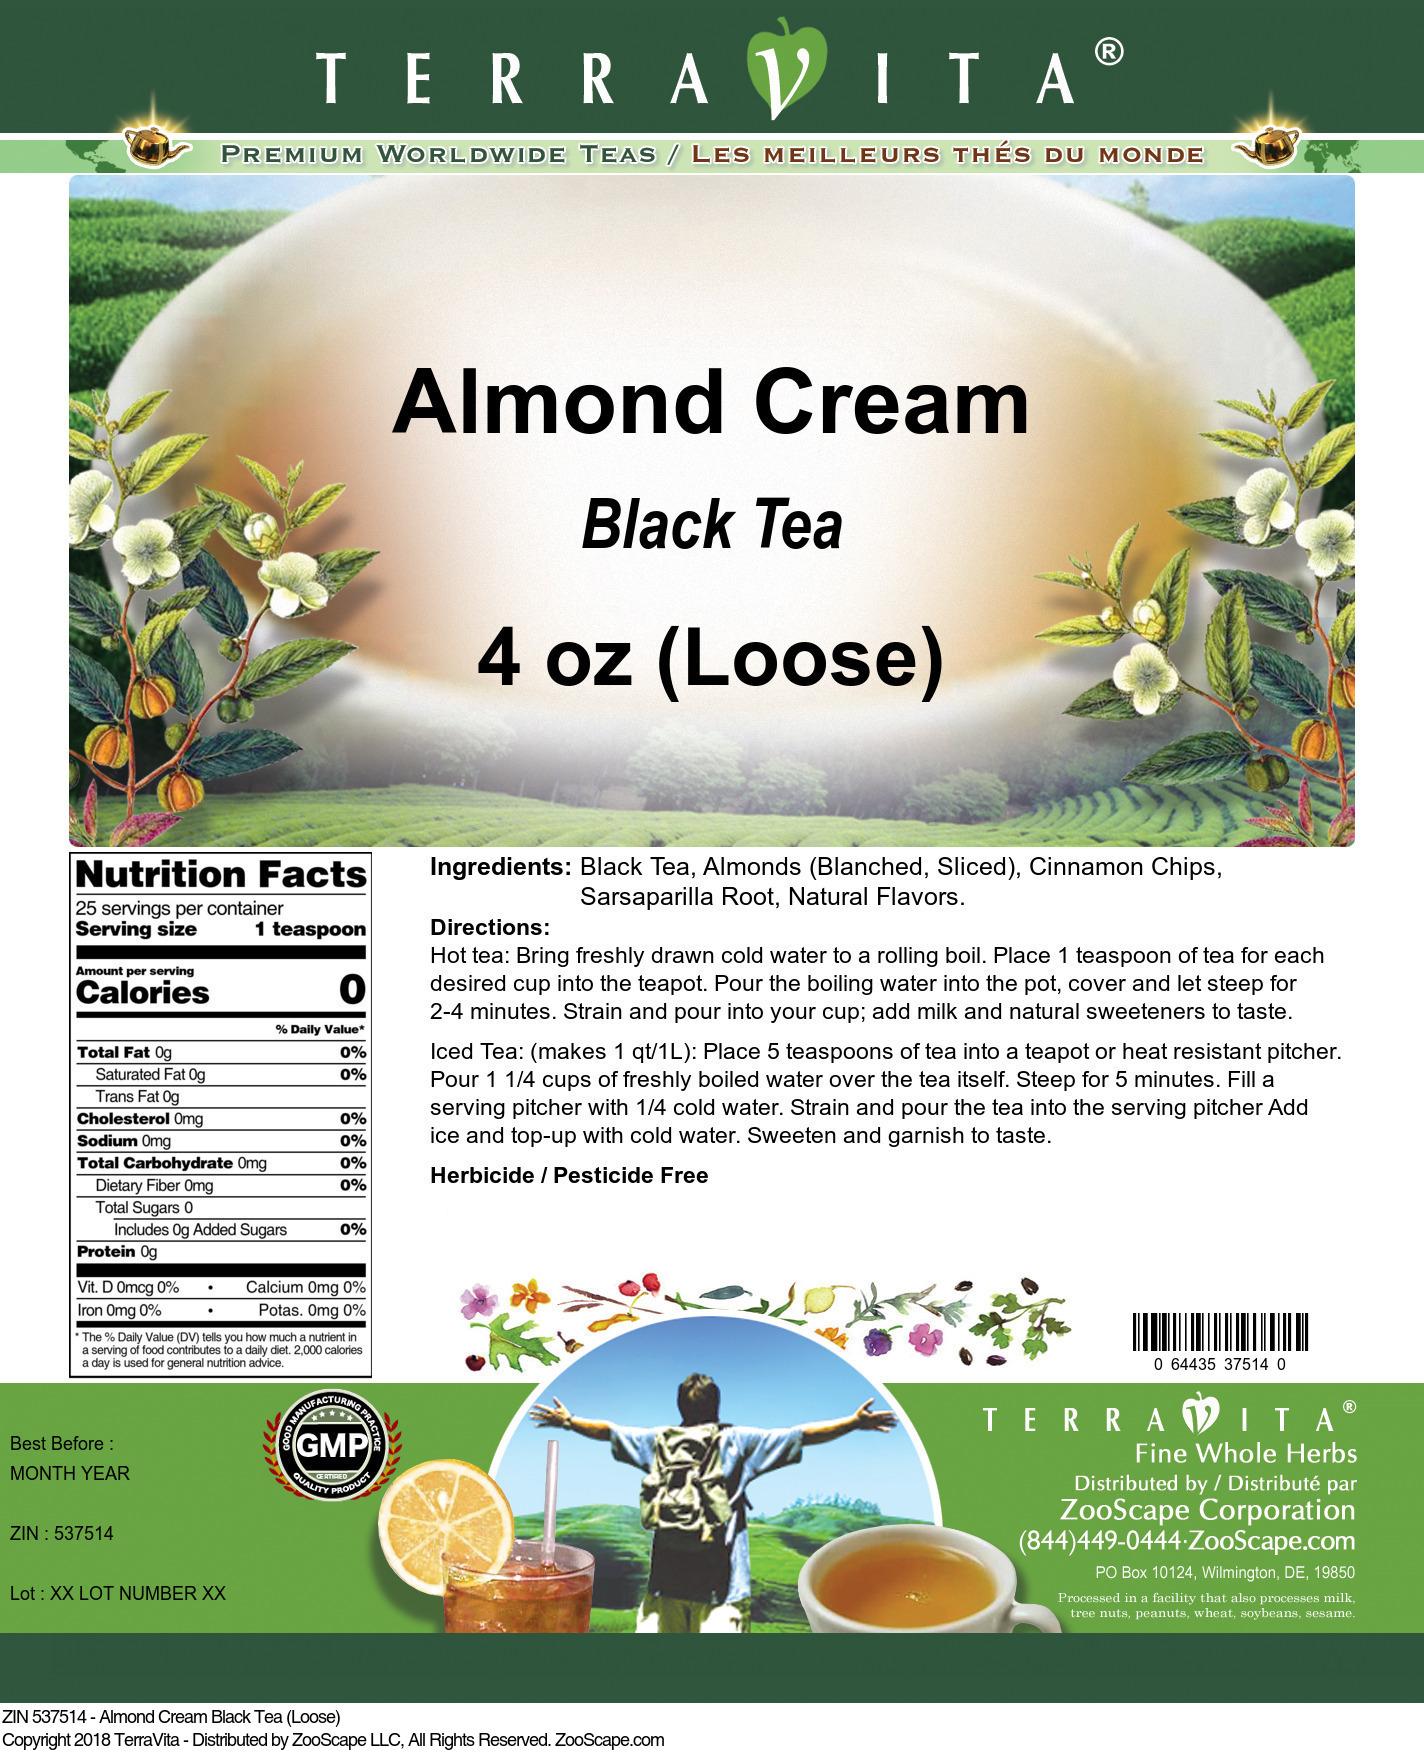 Almond Cream Black Tea